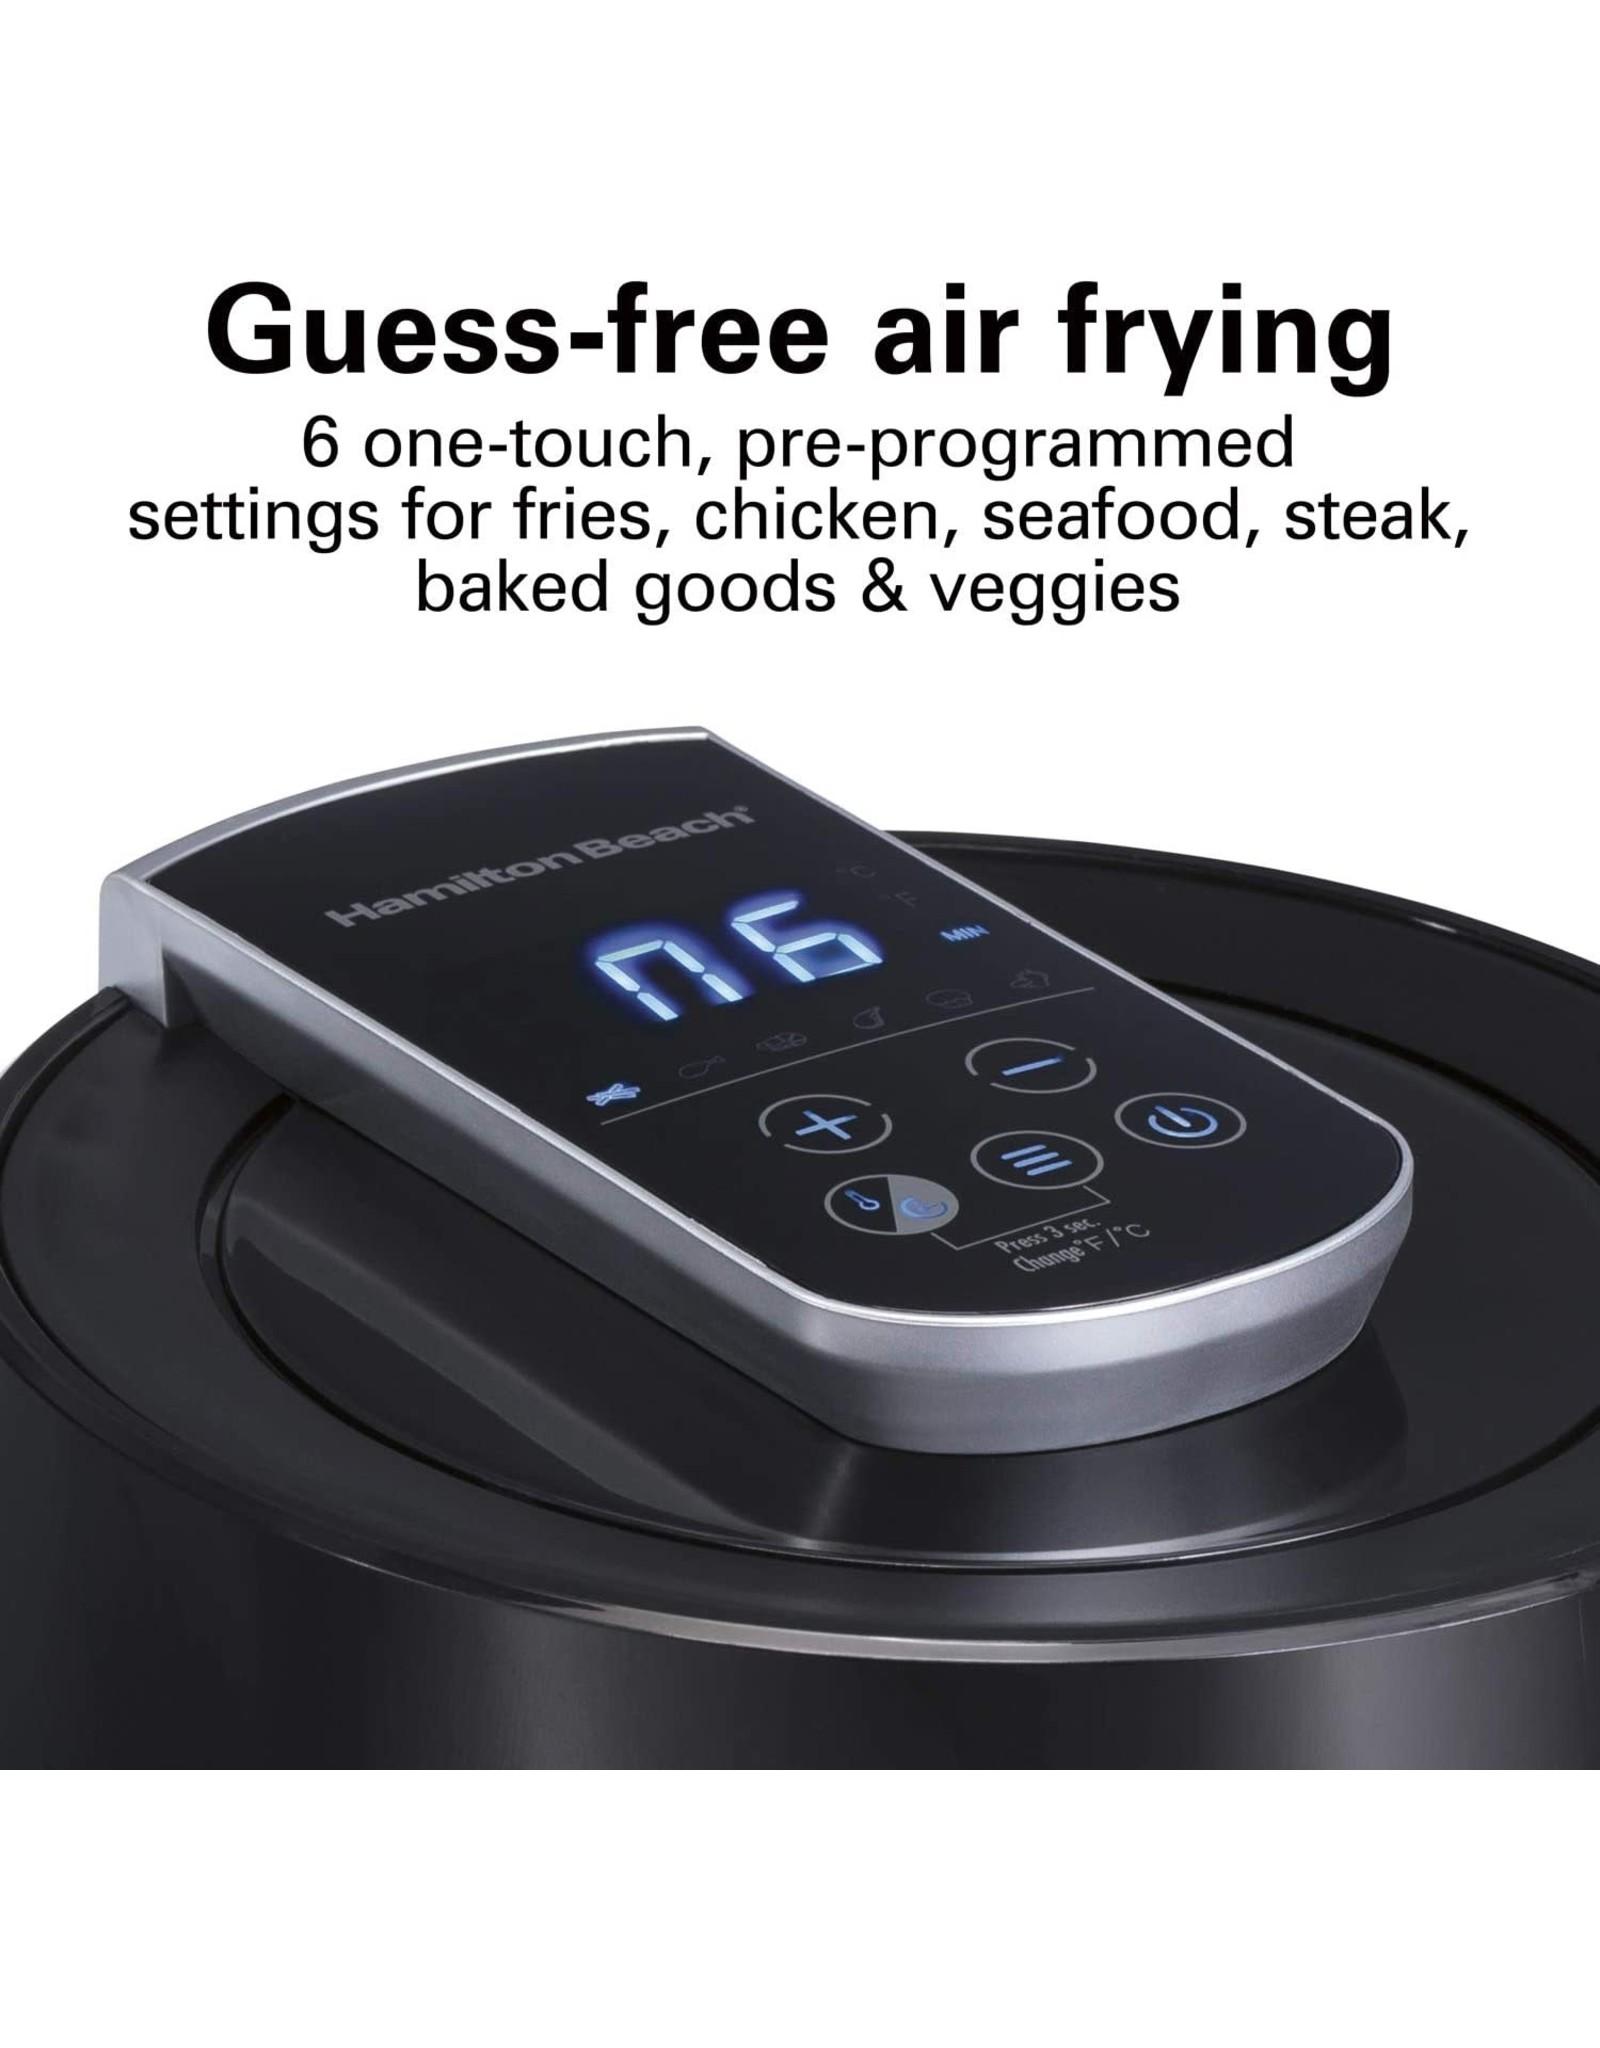 Hamilton Beach Hamilton Beach 35050 Digital Air Fryer Oven with 6 Presets, Easy to Clean Nonstick Basket, Black (35050)